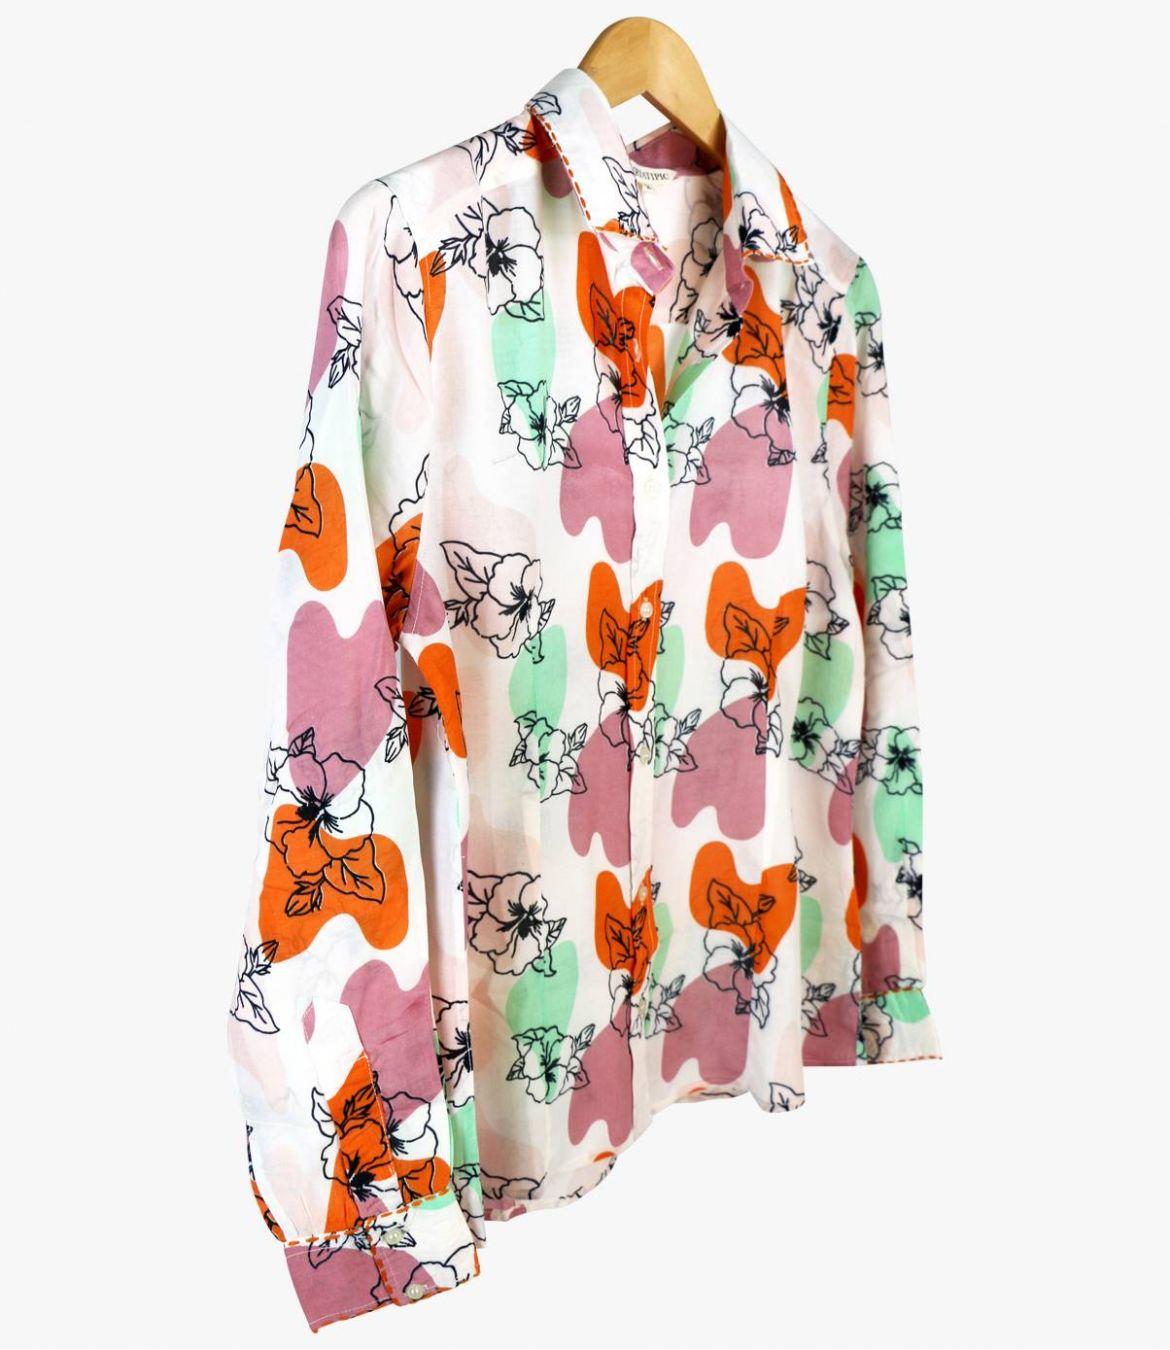 BONI VANYA Women's Modal Shirt Storiatipic - 4